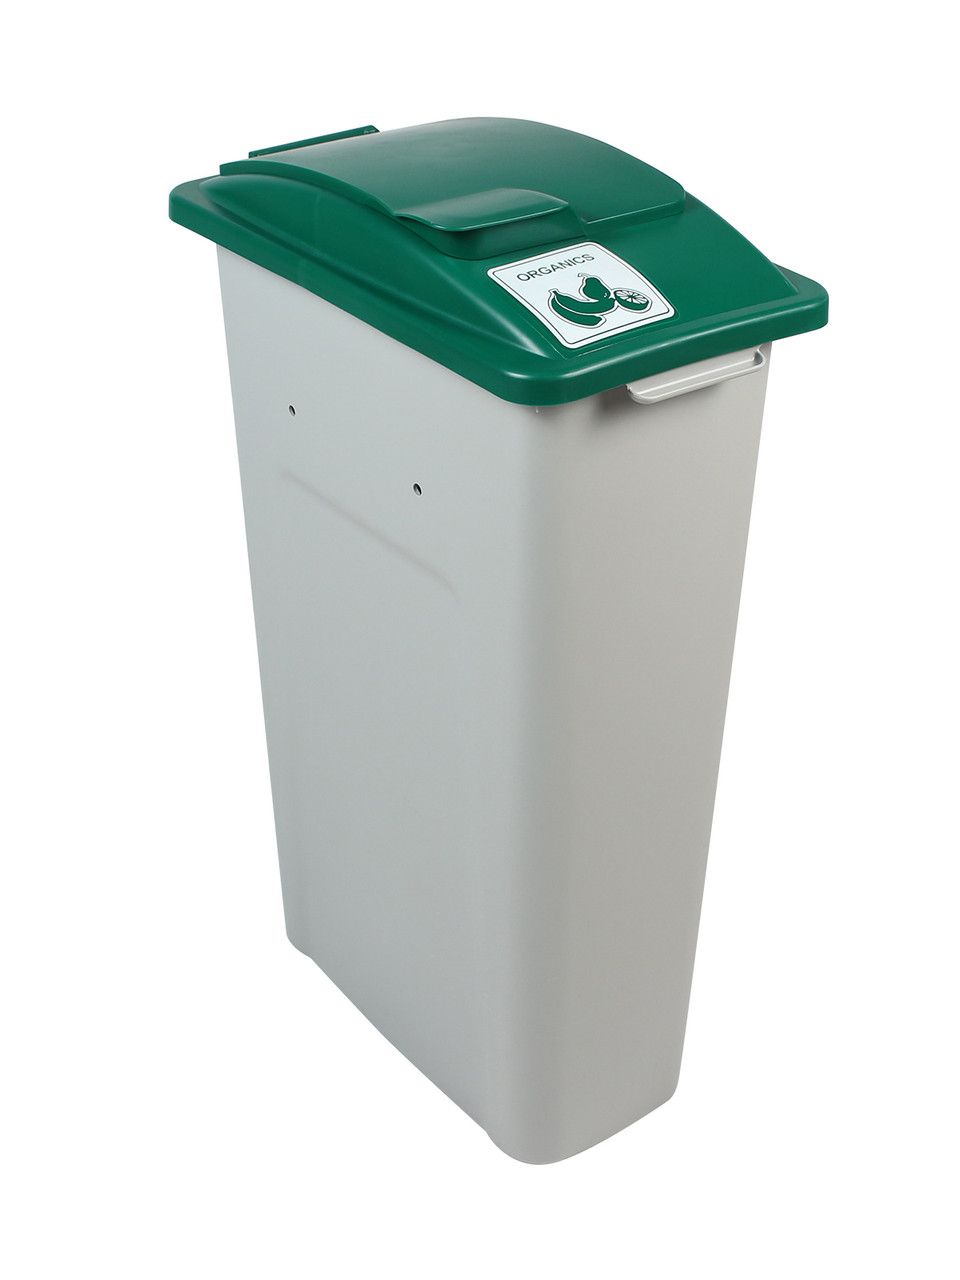 23 Gallon Skinny Simple Sort Compost Bin (Organics, Lift Top)